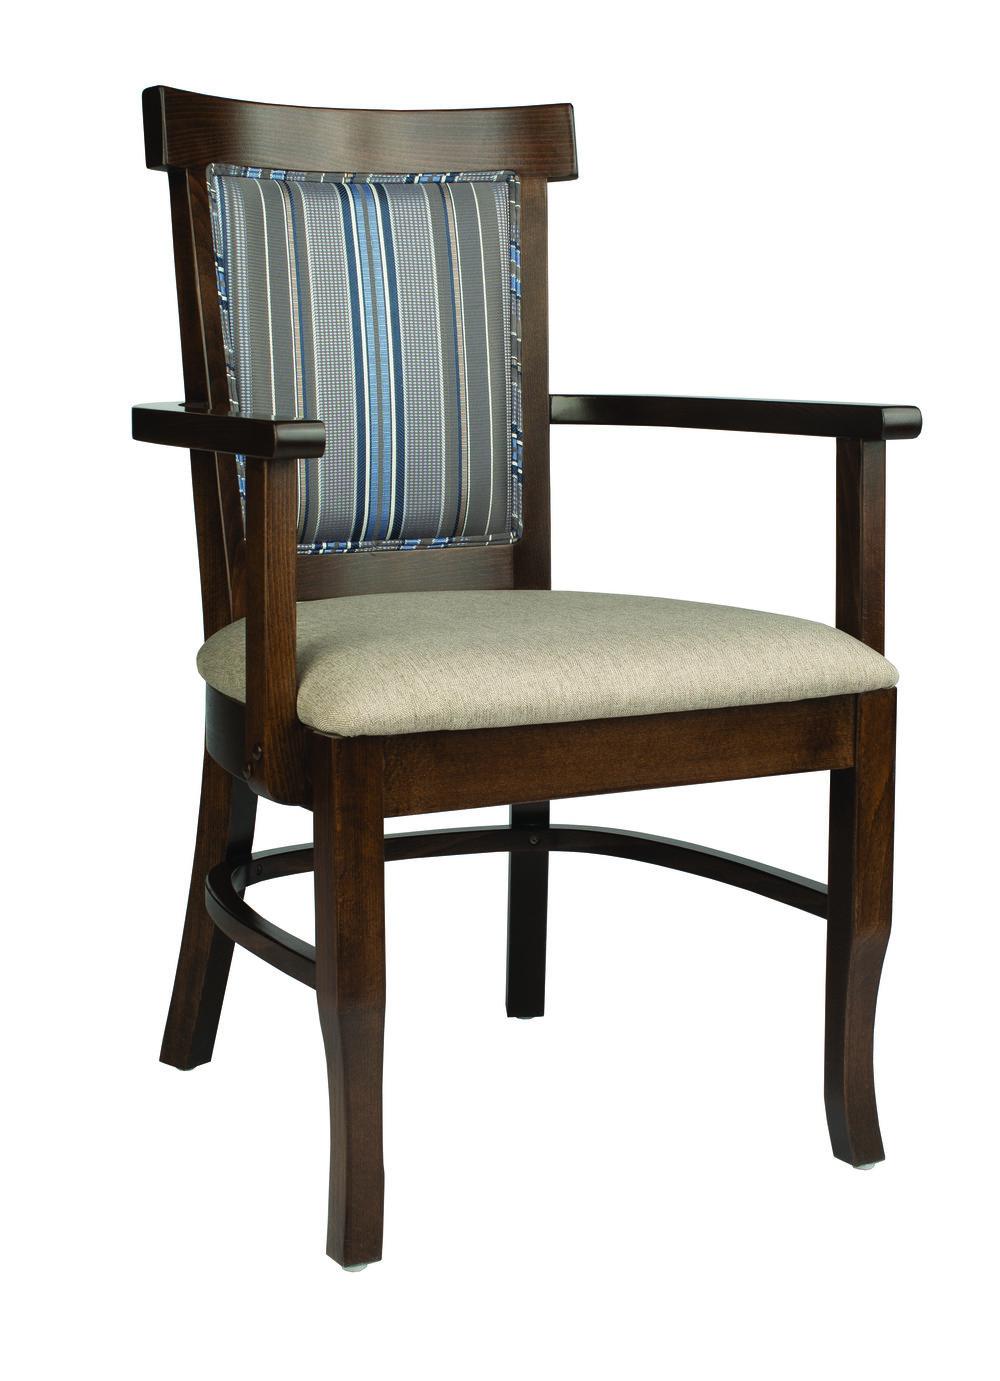 Tudor_Armchair_671-TCL,_OSB-Seat_Jennis_Foundation_Fawn_67,_ISB_Jennis_Clarity_Navy_306_(Front).jpg